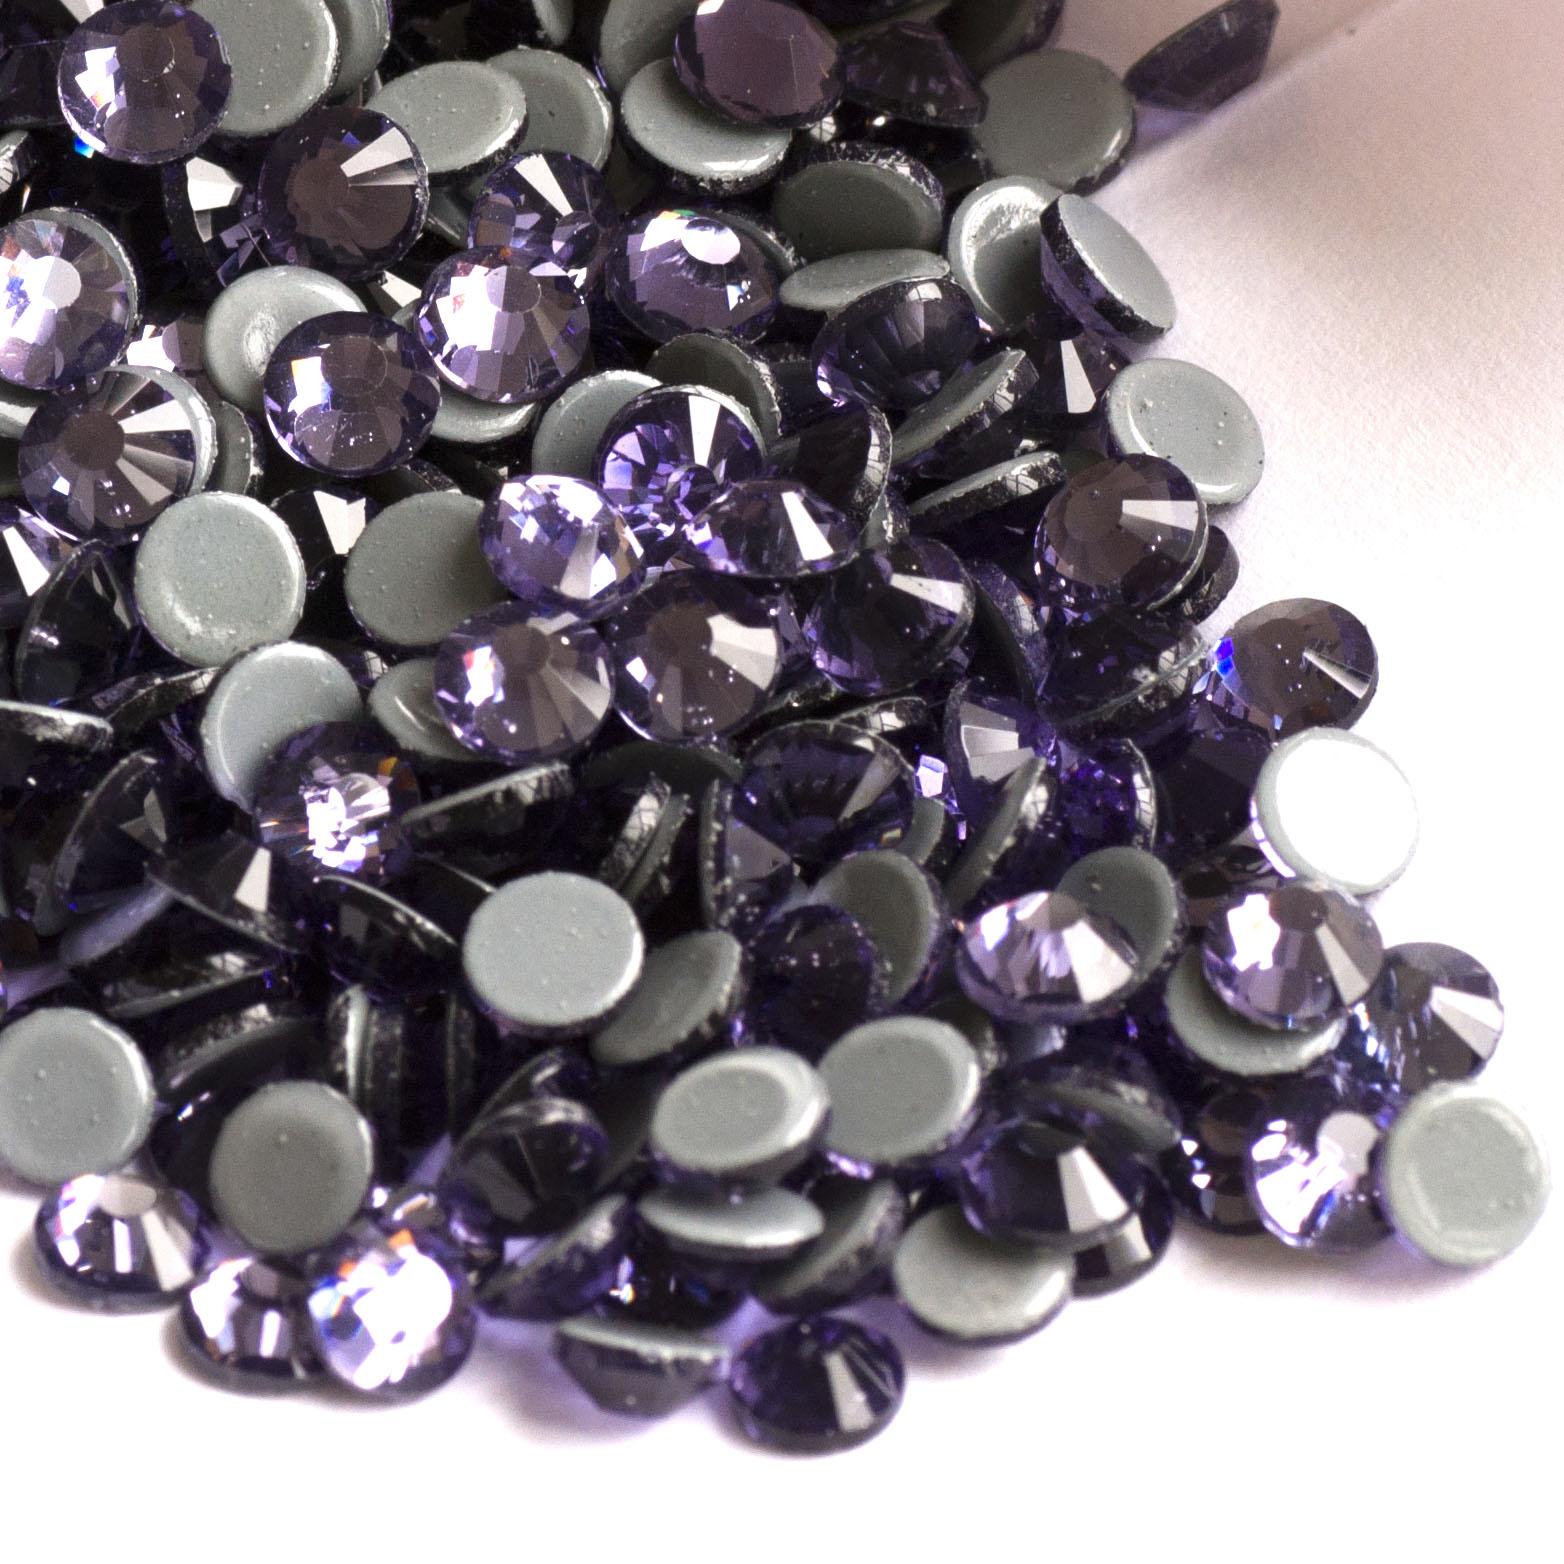 YANRUO Strass SS10 SS16 SS20 SS30 Tanzanite rinovon tufat cristal - Arte, zanate dhe qepje